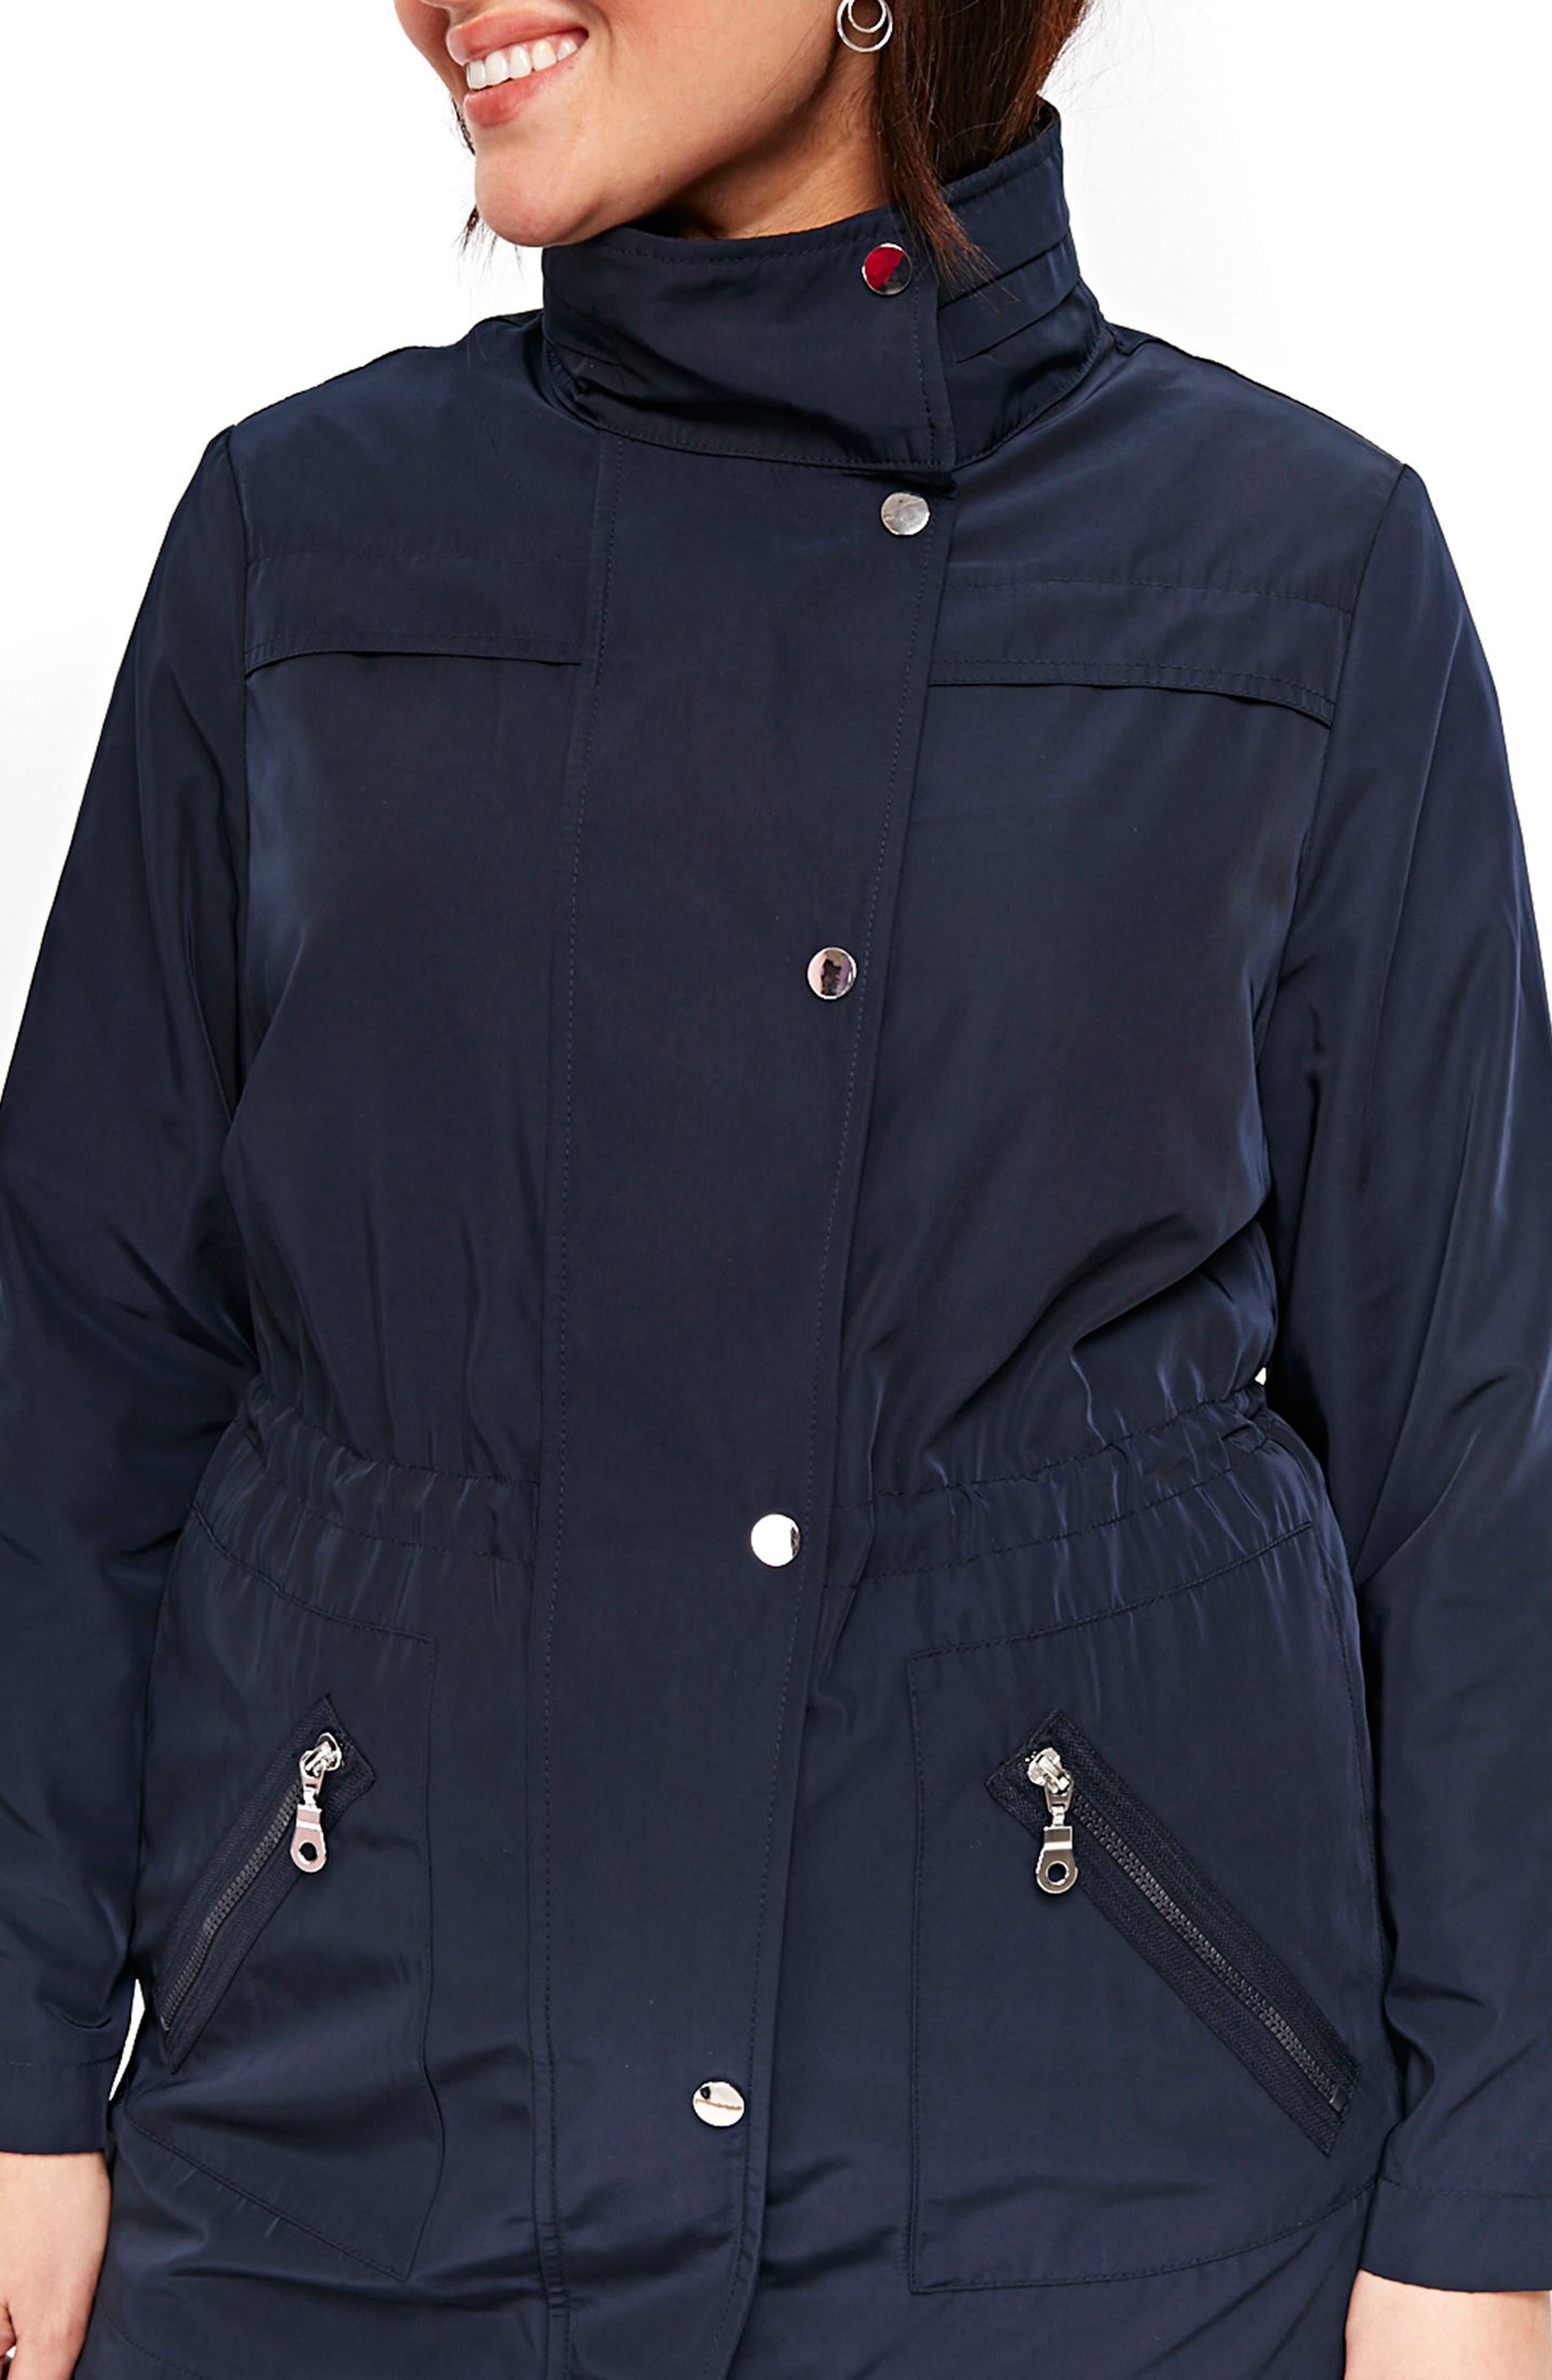 Zip Trim Jacket,                             Alternate thumbnail 2, color,                             Navy Blue